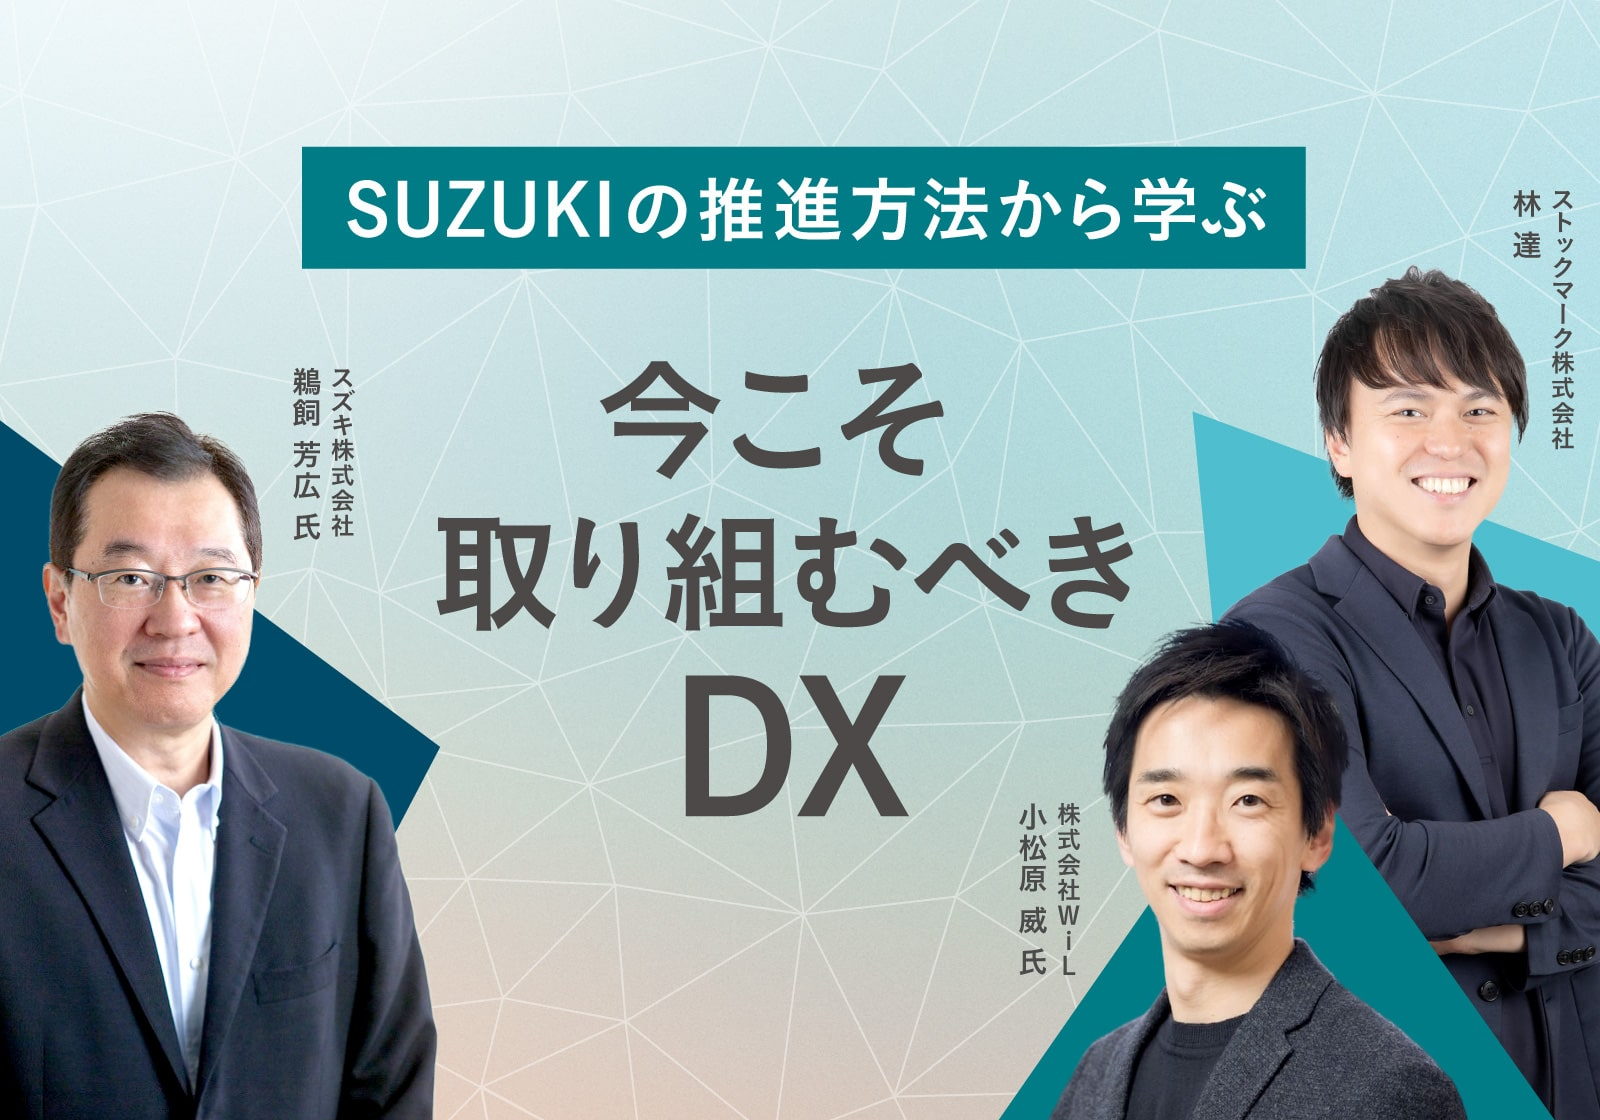 SUZUKI様とのDXオンラインセミナーの画像